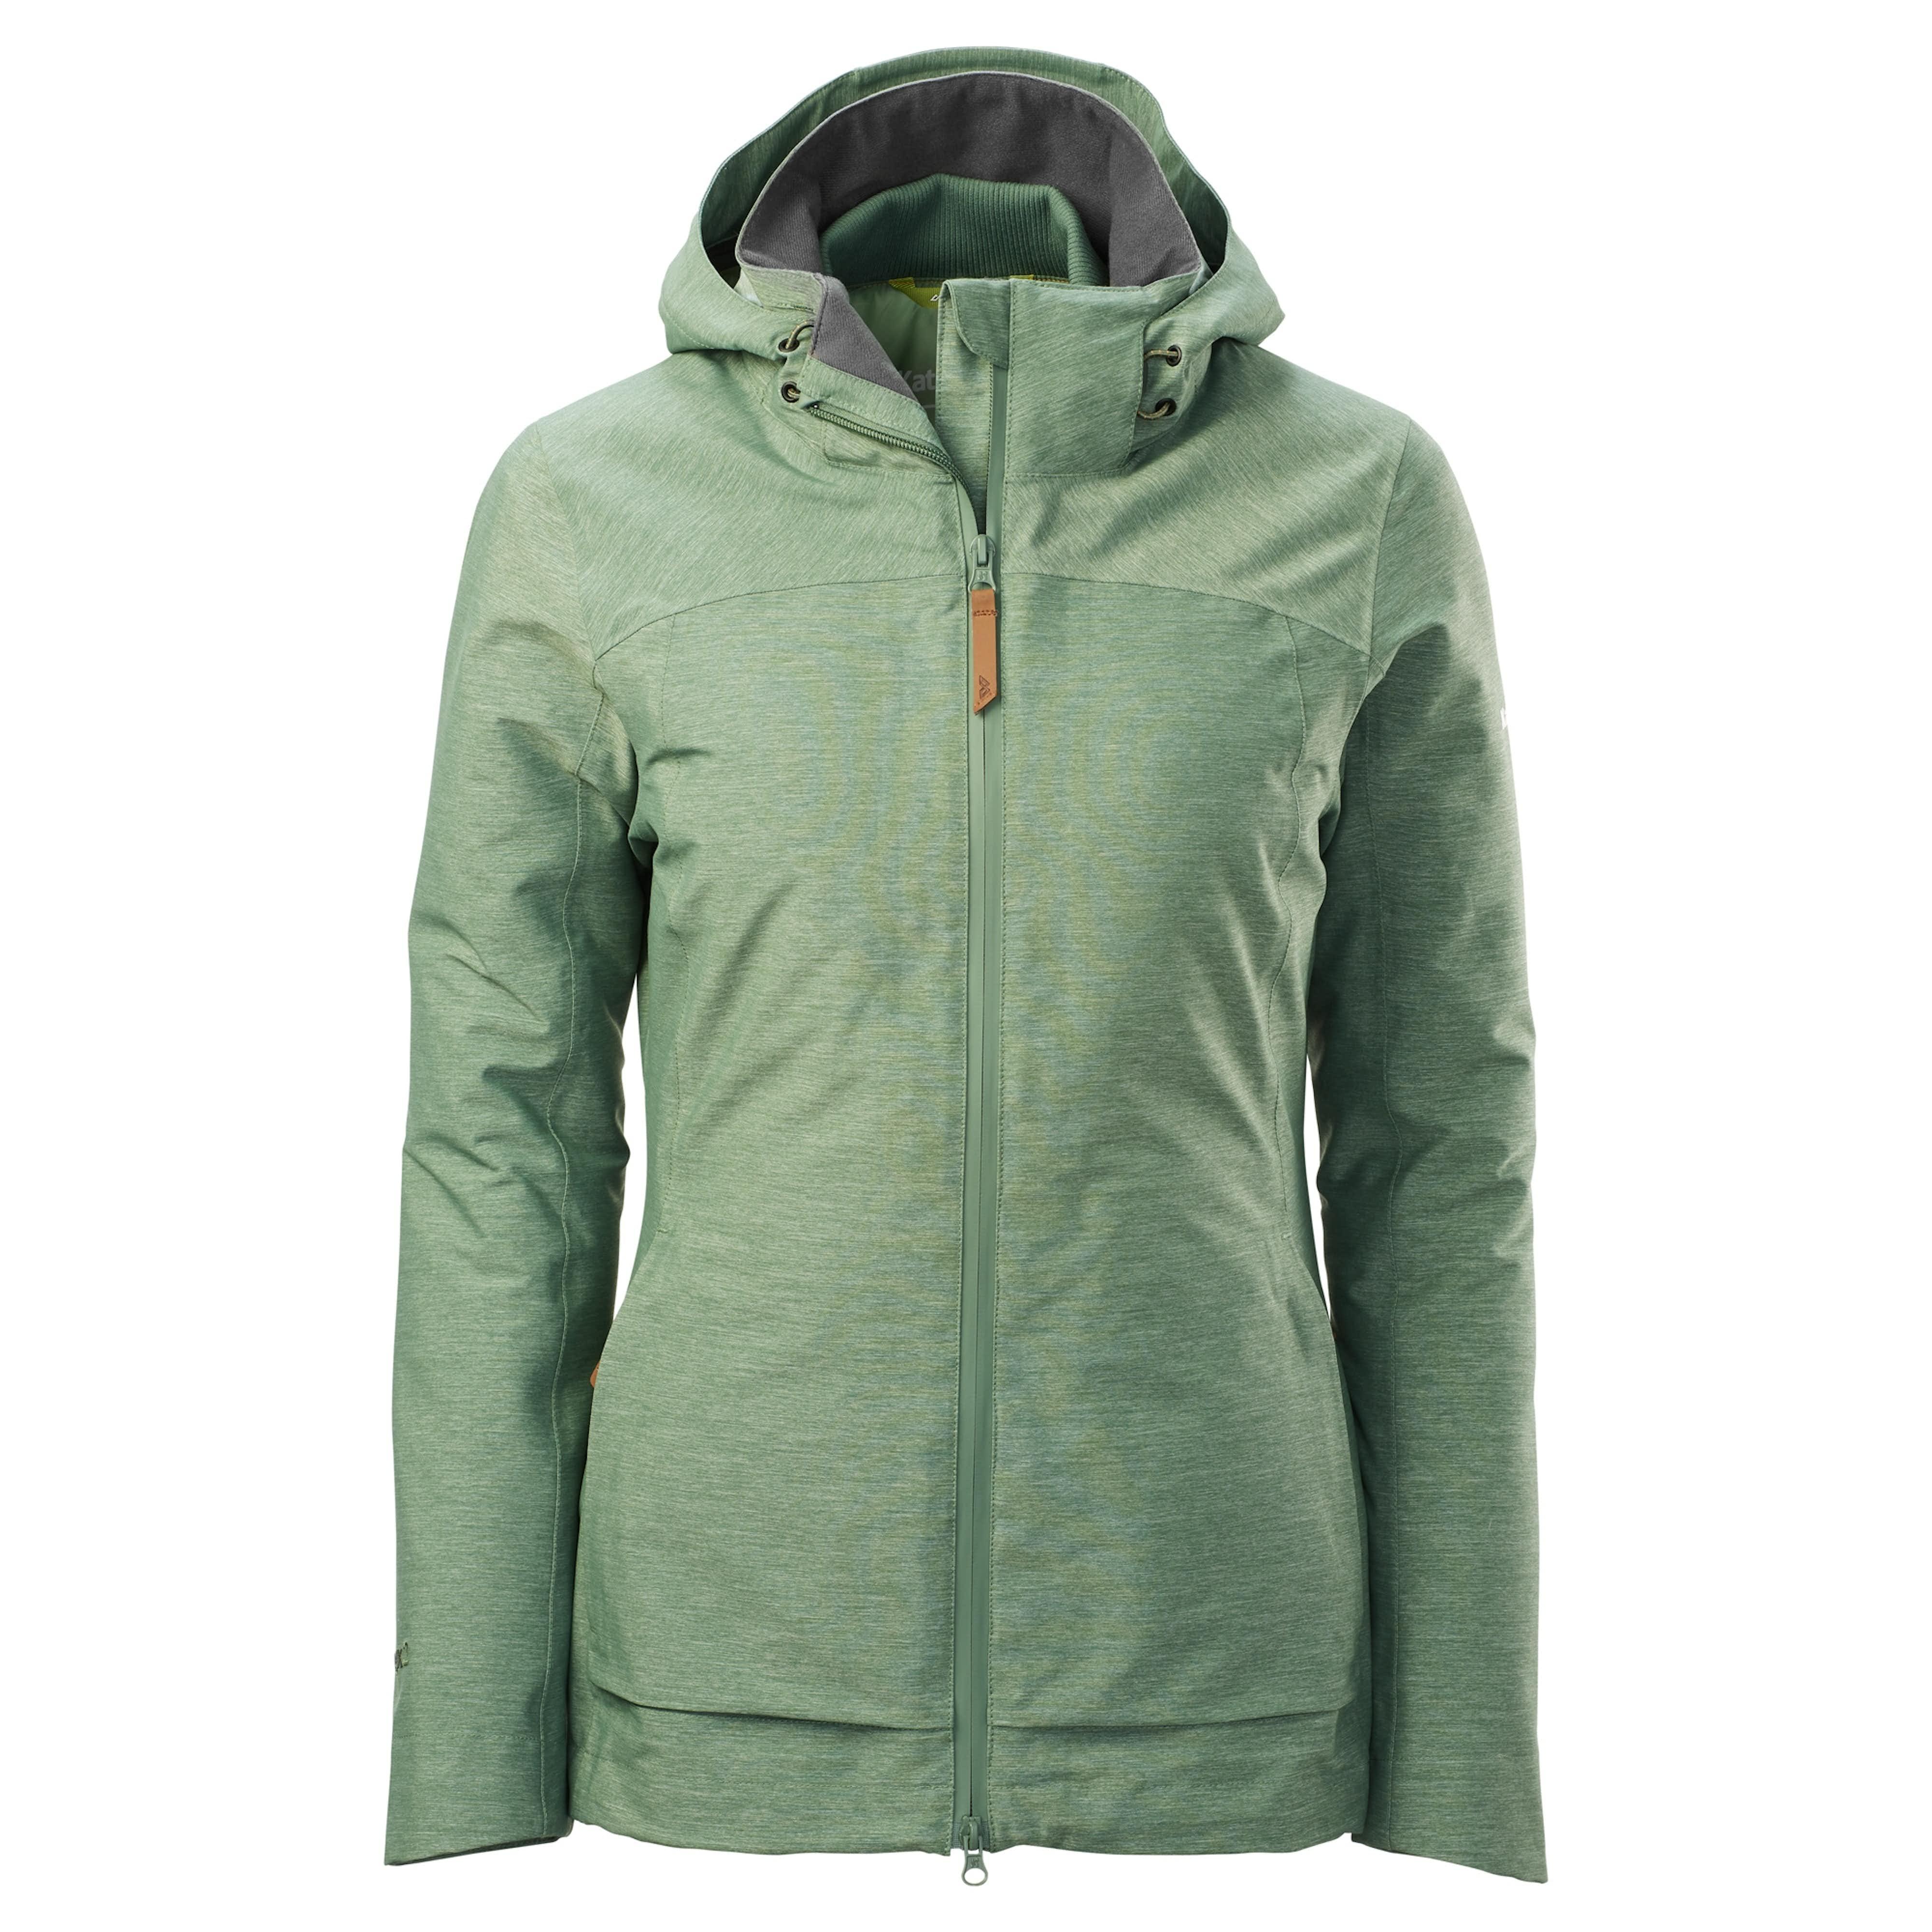 Benmore Women s ngx 5-in-1 Travel Rain Jacket bba1ecc36